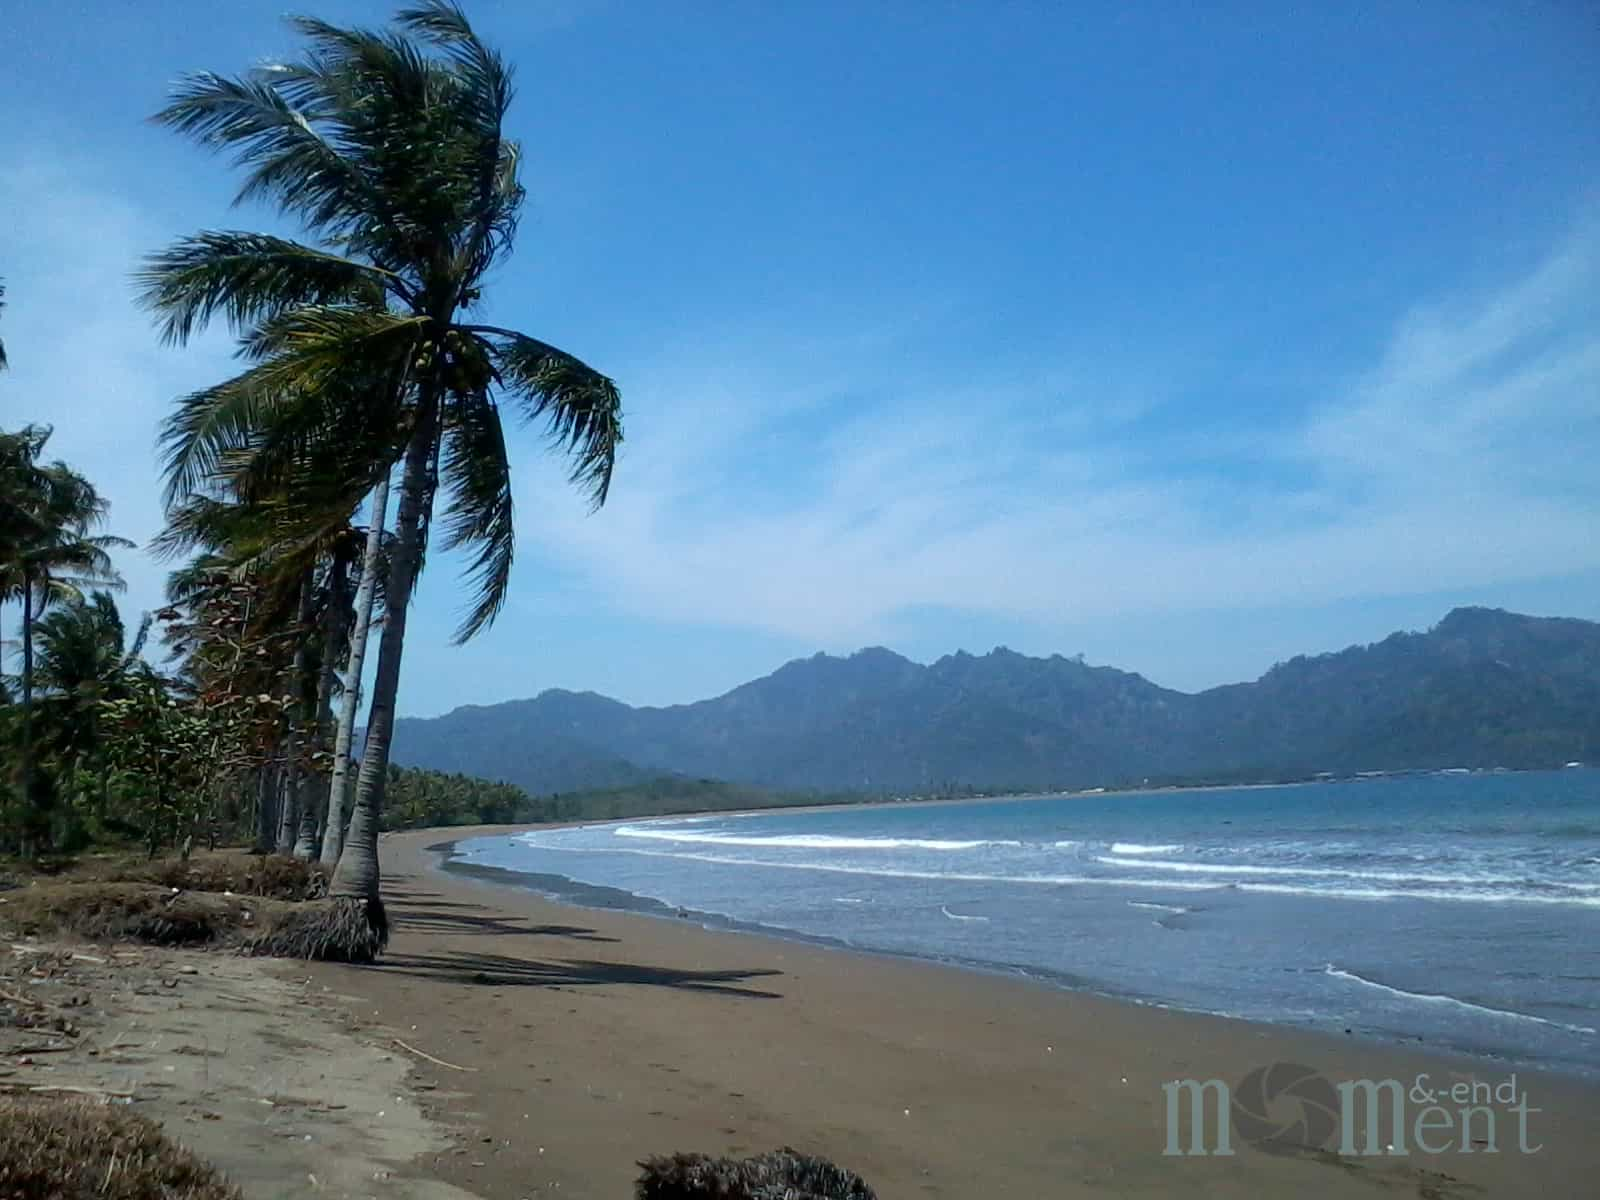 Pantai Cengkrong Trenggalek